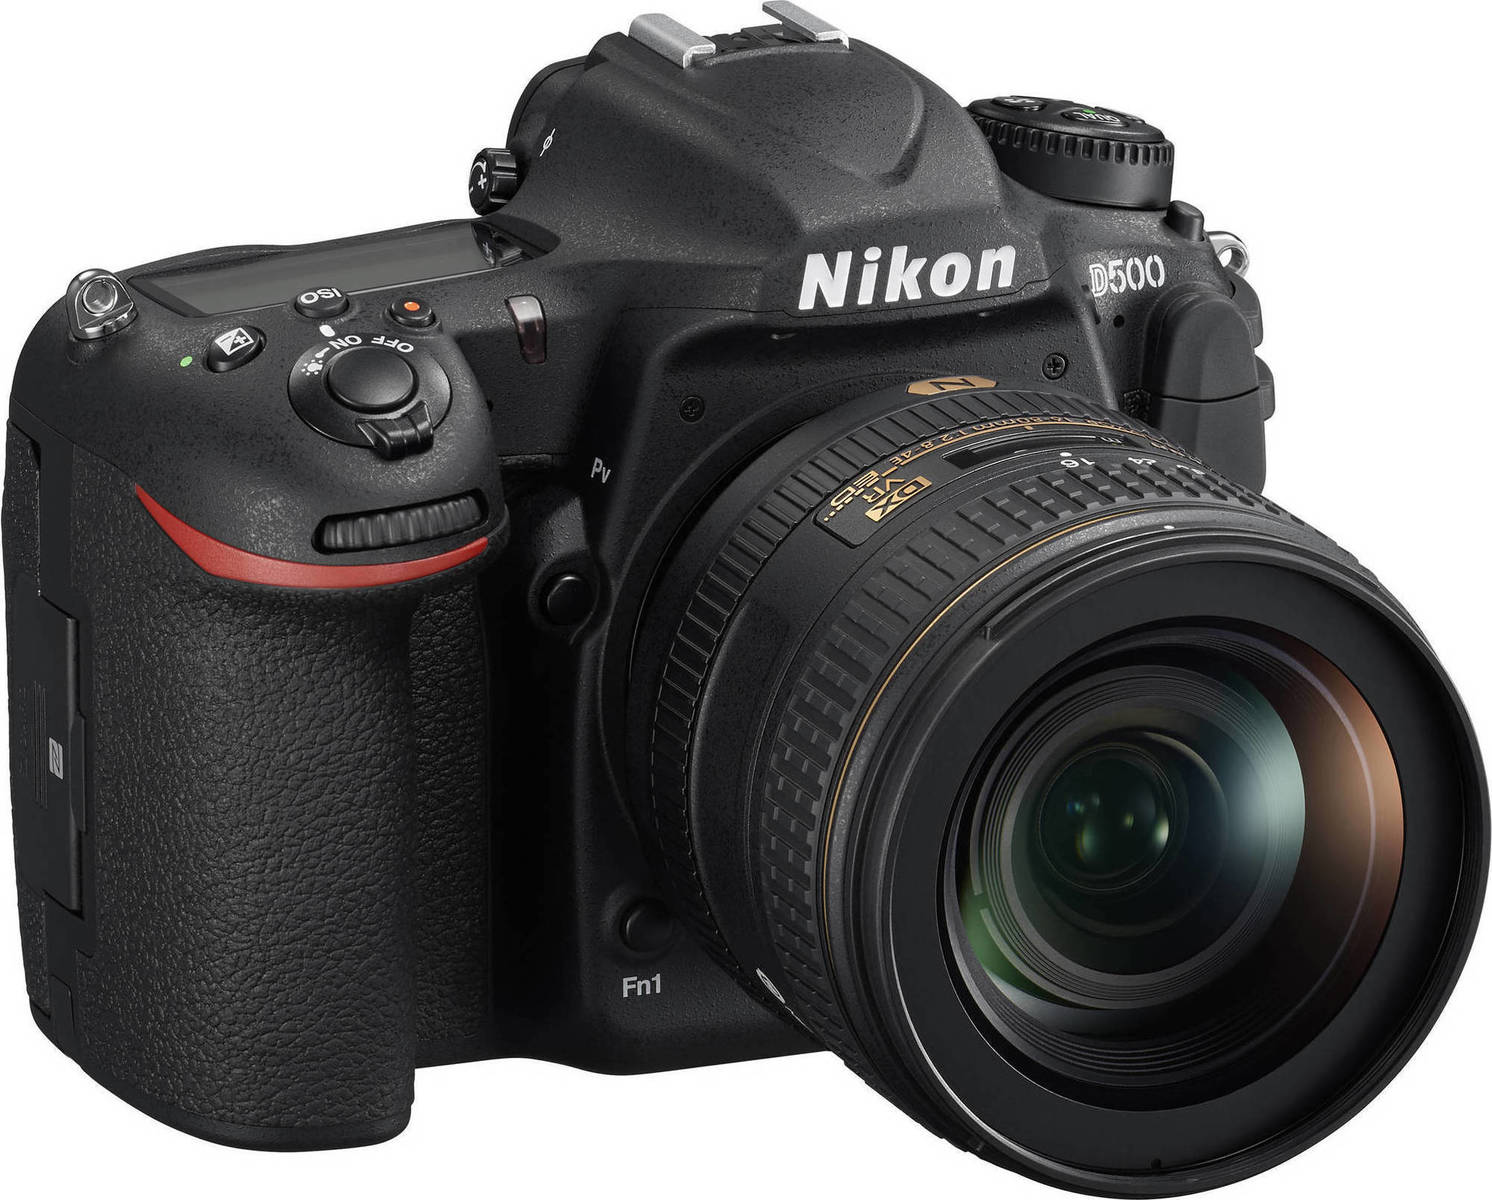 Nikon D500 kit 16-80mm f/2.8-4E ED VR, 20.9MPx, 4K UHD, In-Camera Time Lapse, Wi-Fi, Bluetooth, NFC